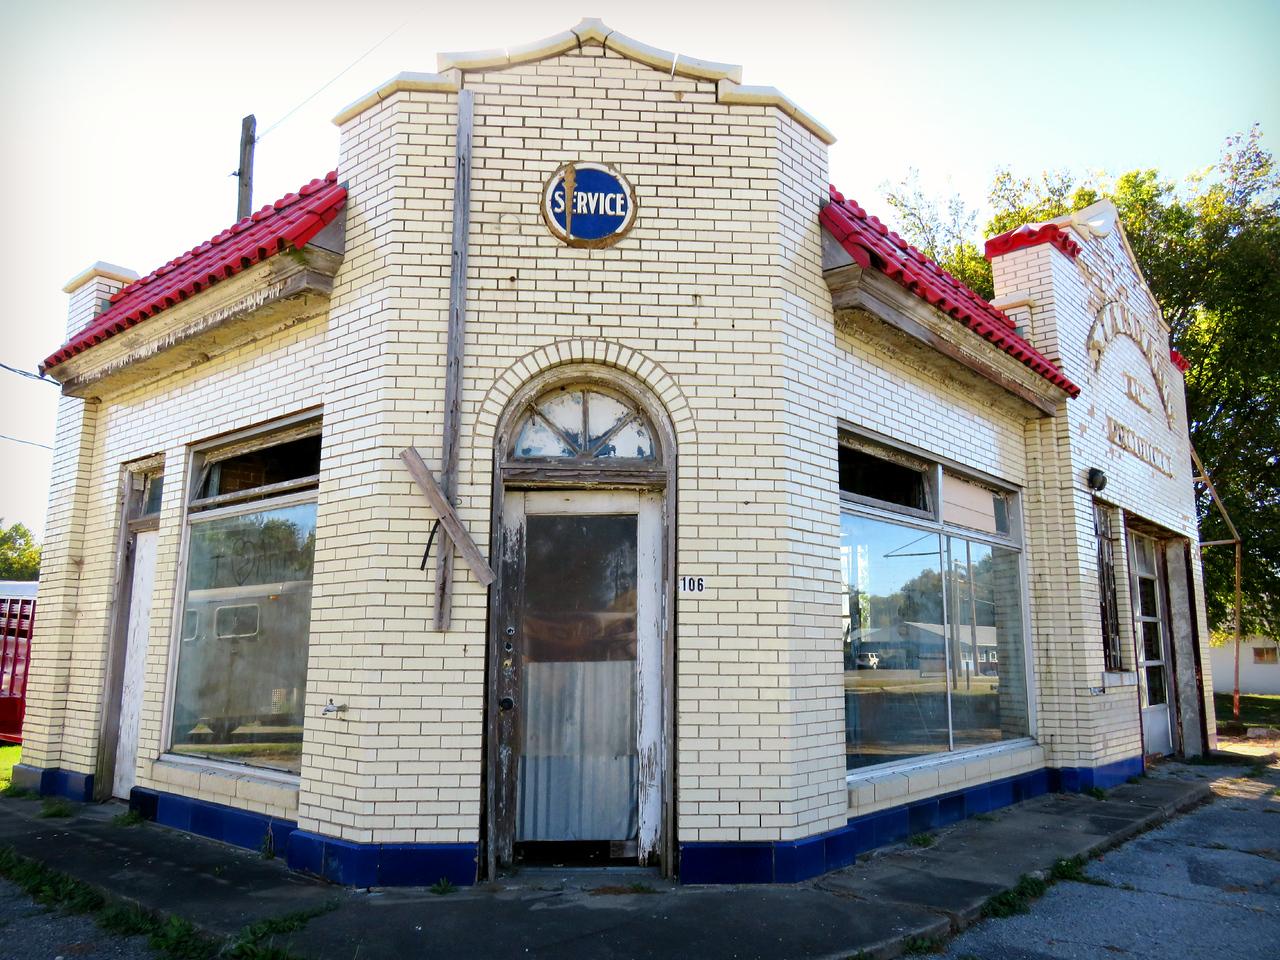 Vienna Illinois decaying Standard Oil Station